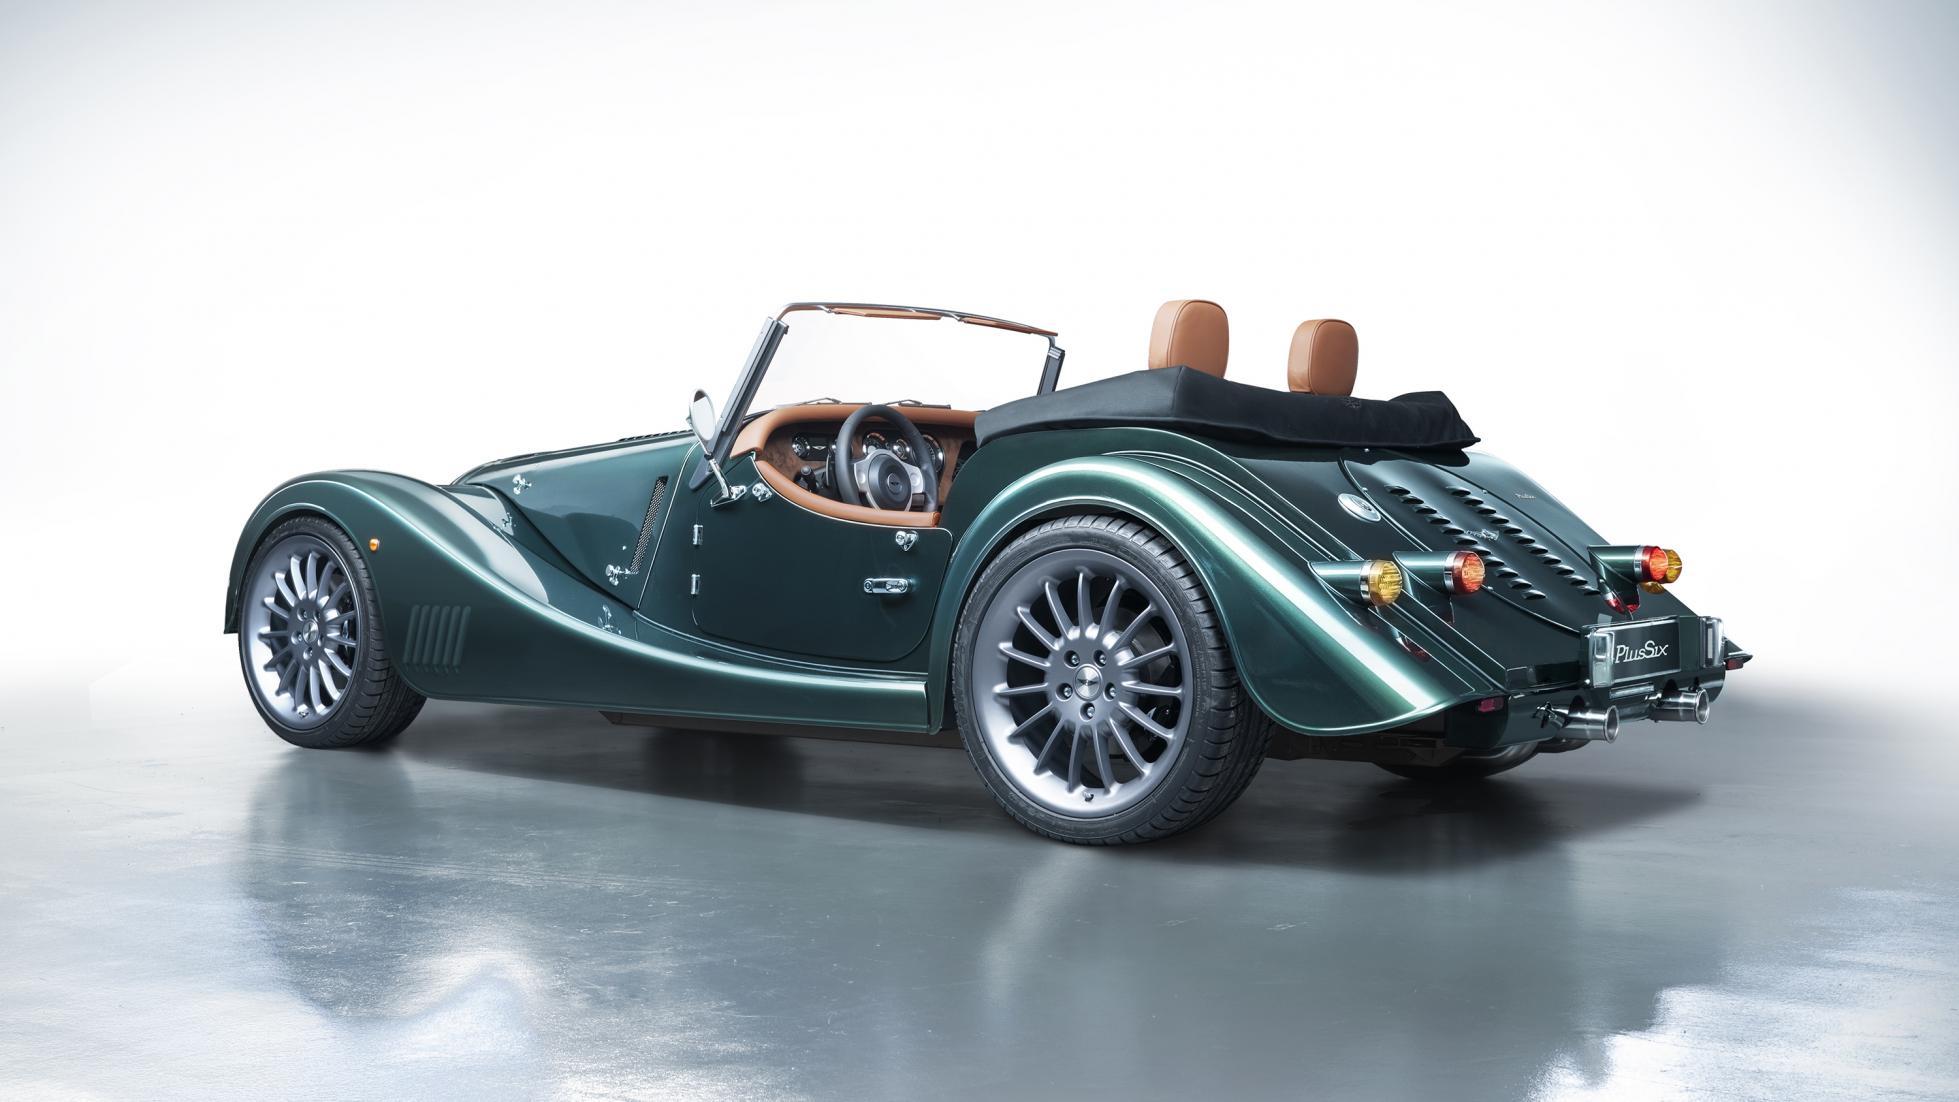 Green Morgan Plus Six rear 3/4